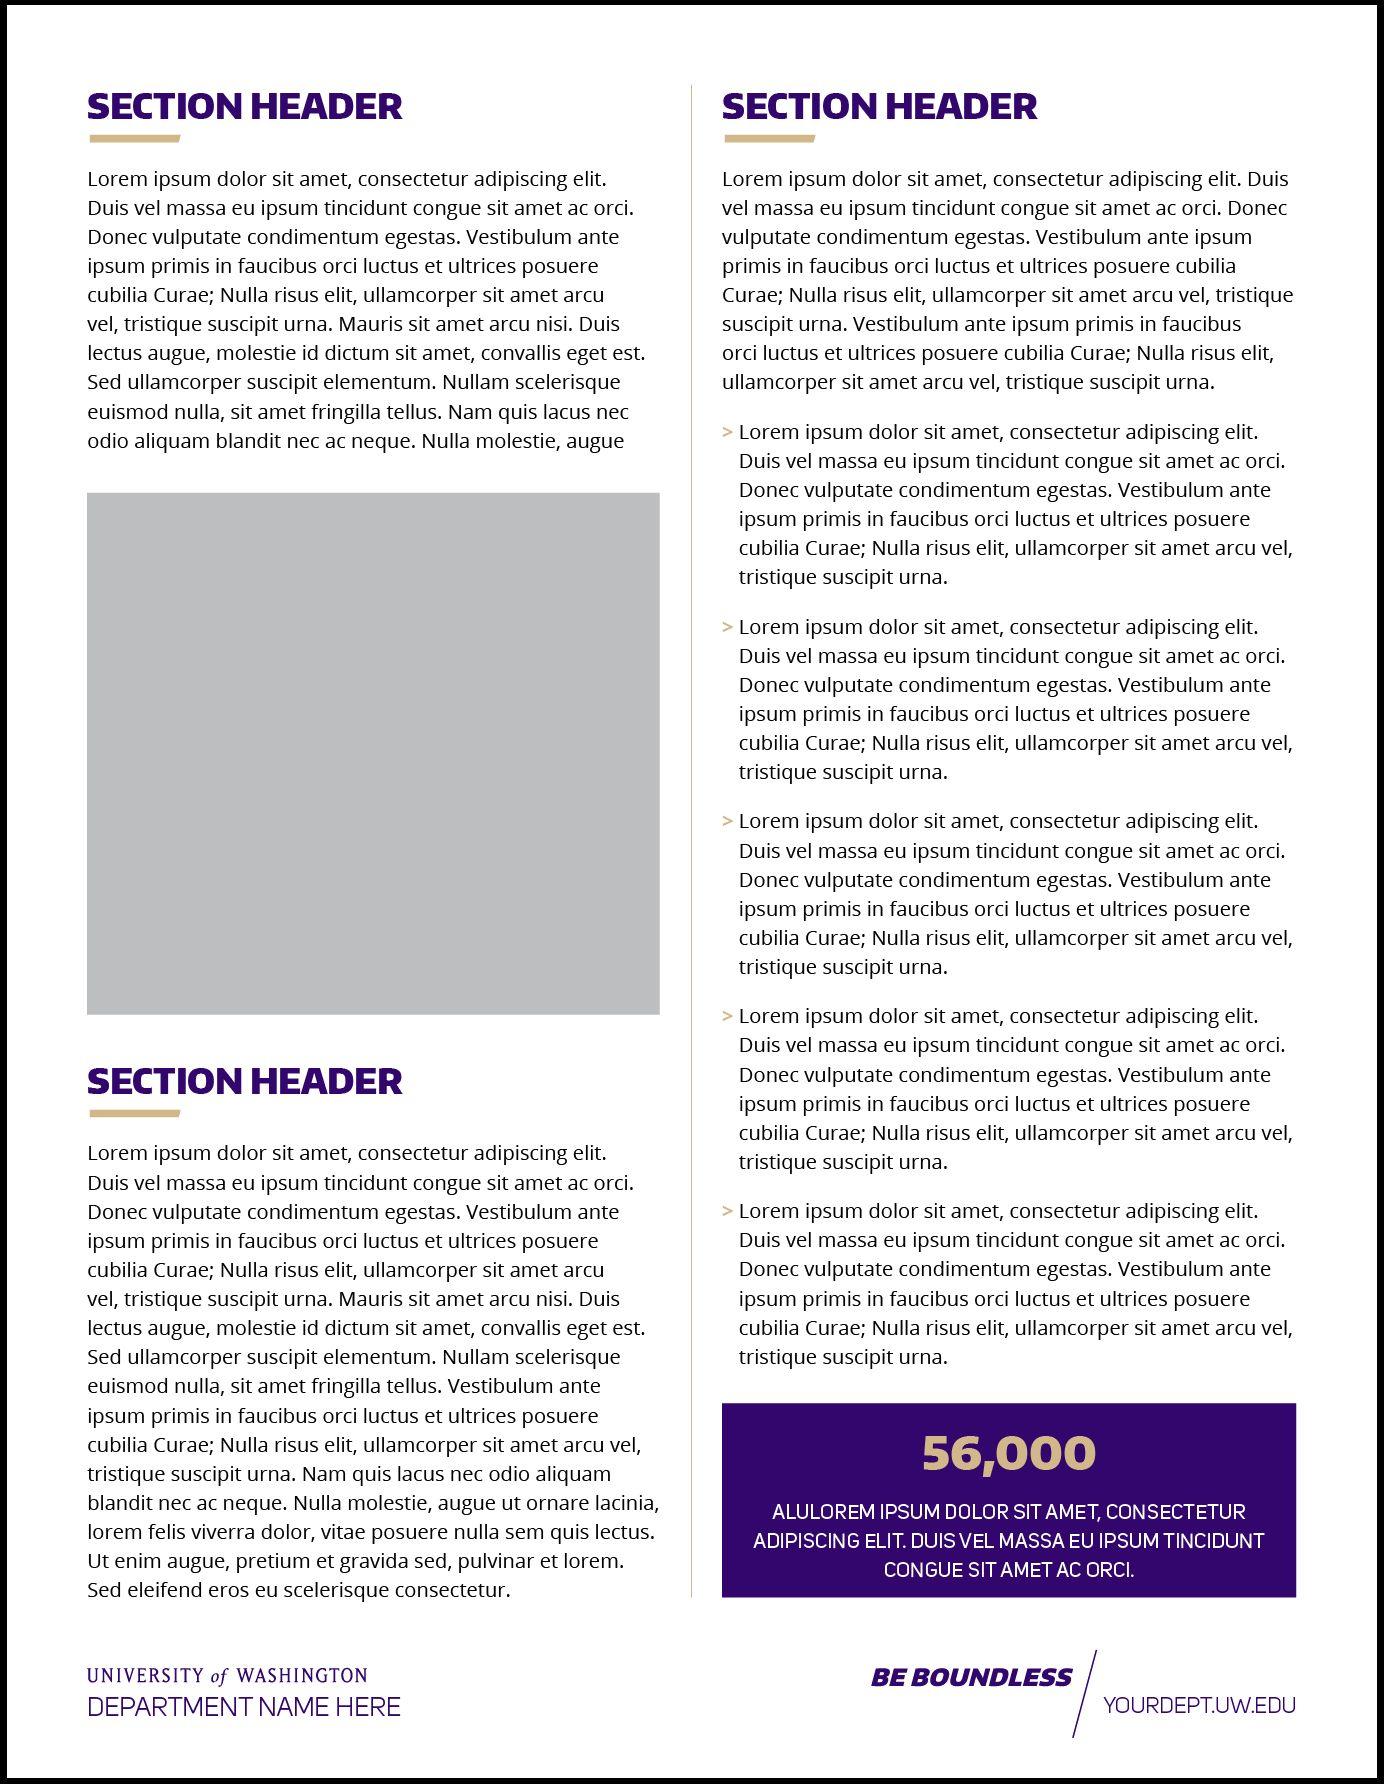 Fact Sheet Uw Brand Pertaining To Fact Sheet Template Microsoft Word Best Professional Templates Fact Sheet Business Template Word Pictures Fact sheet templates microsoft word